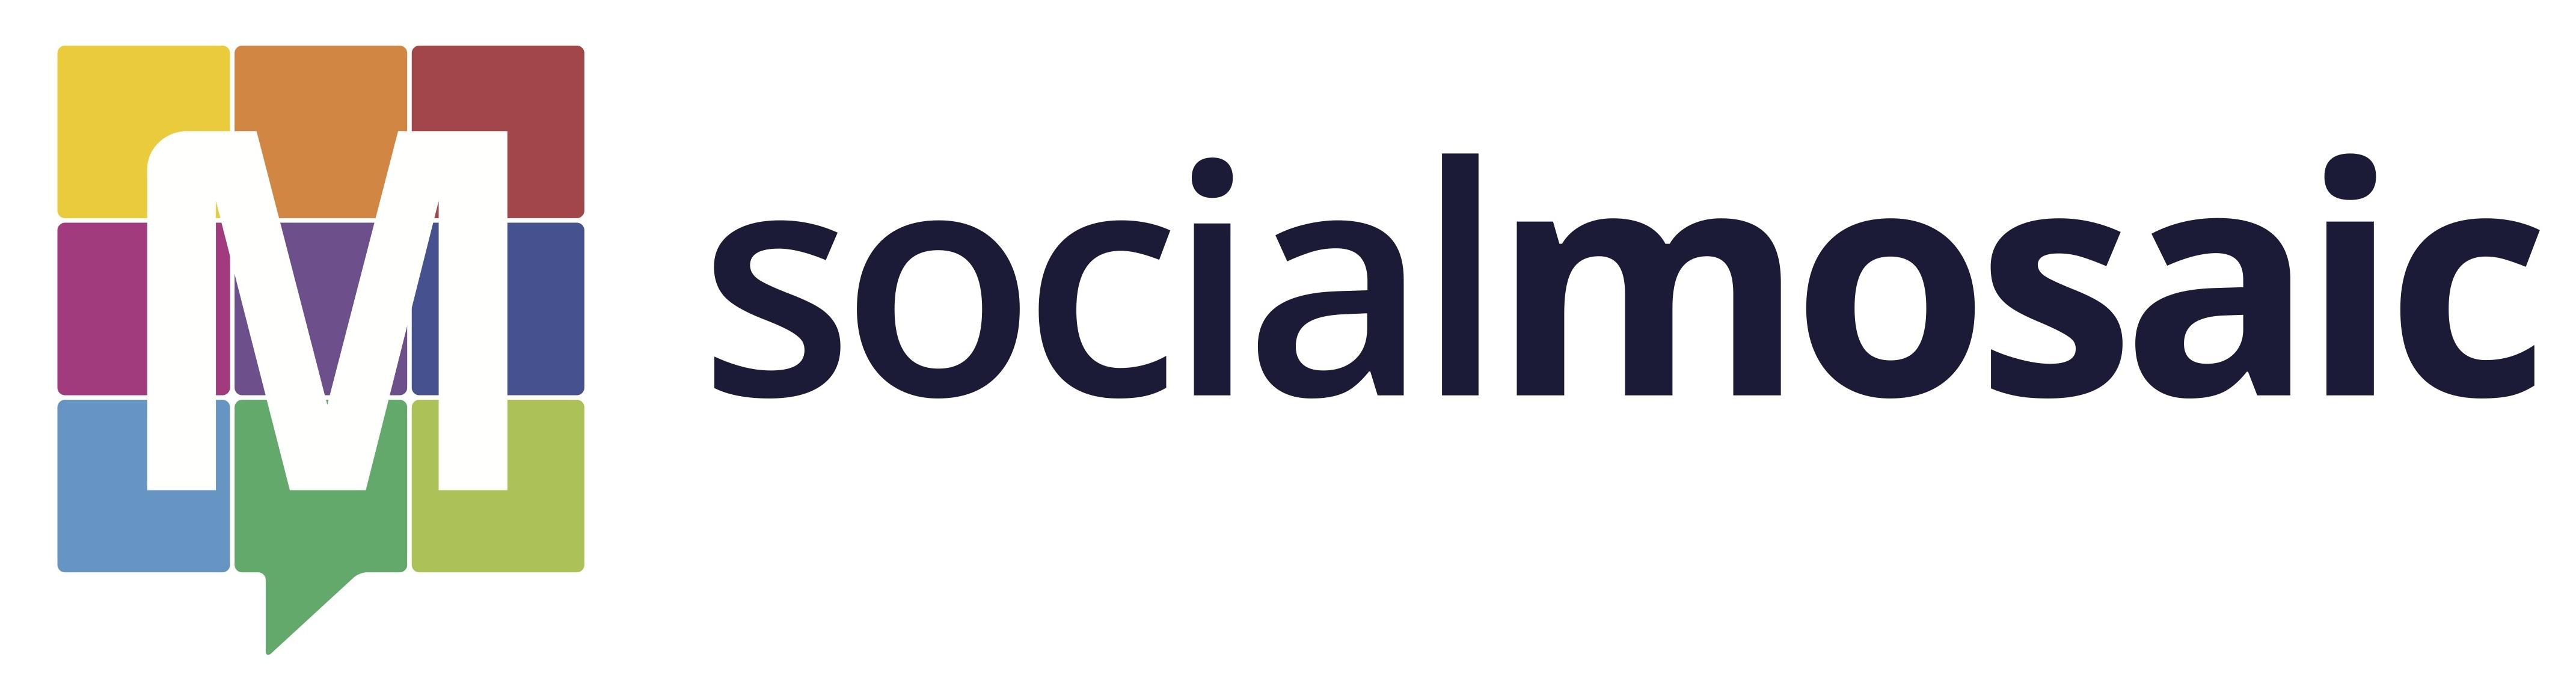 SocialMosaic-Logo.ai_.jpg